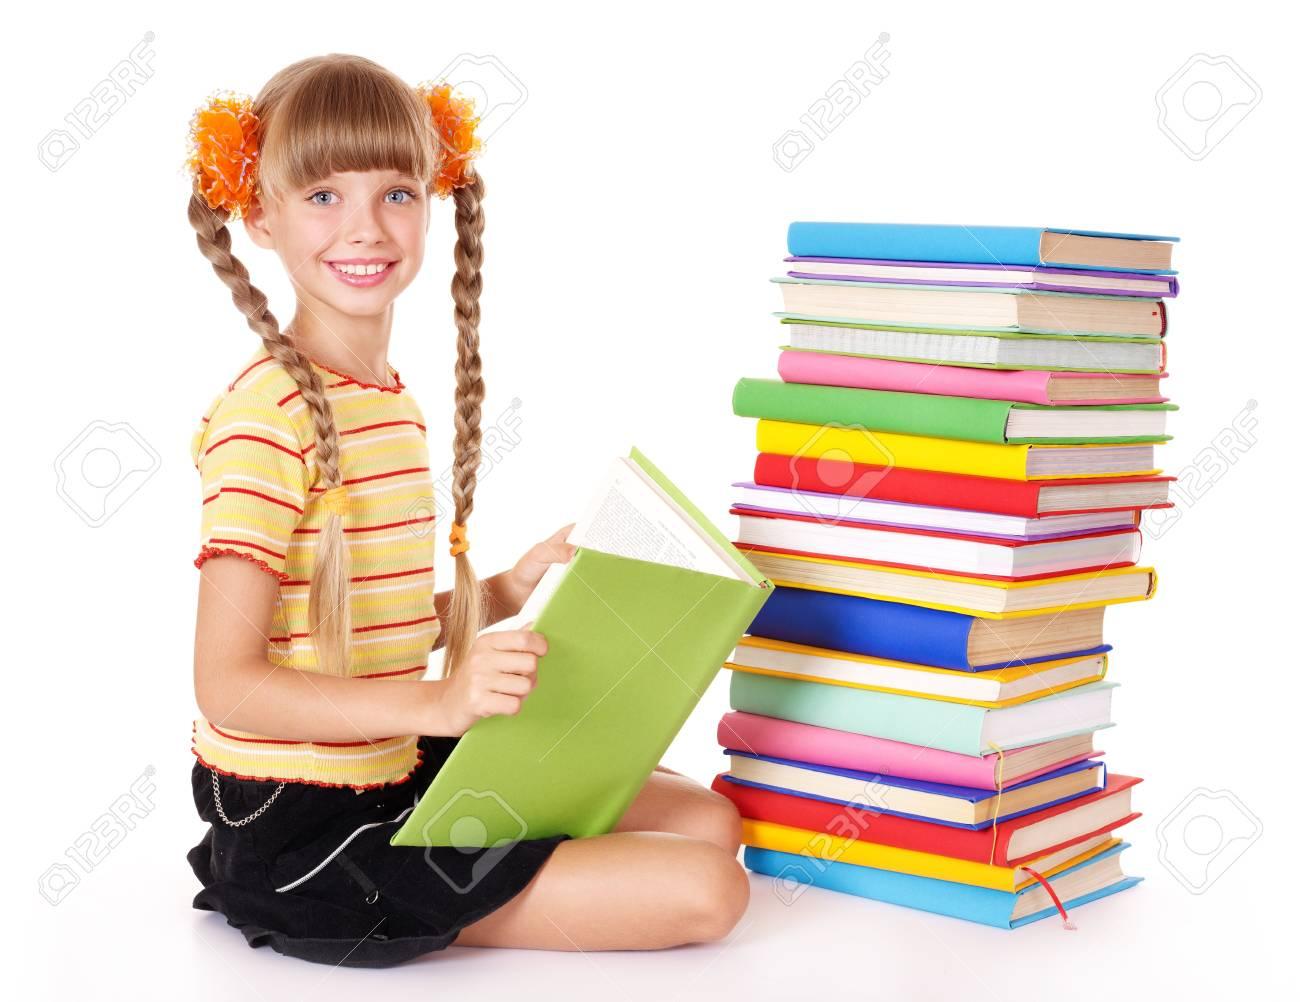 Little girl reading pile of books. Isolated. Stock Photo - 8781708